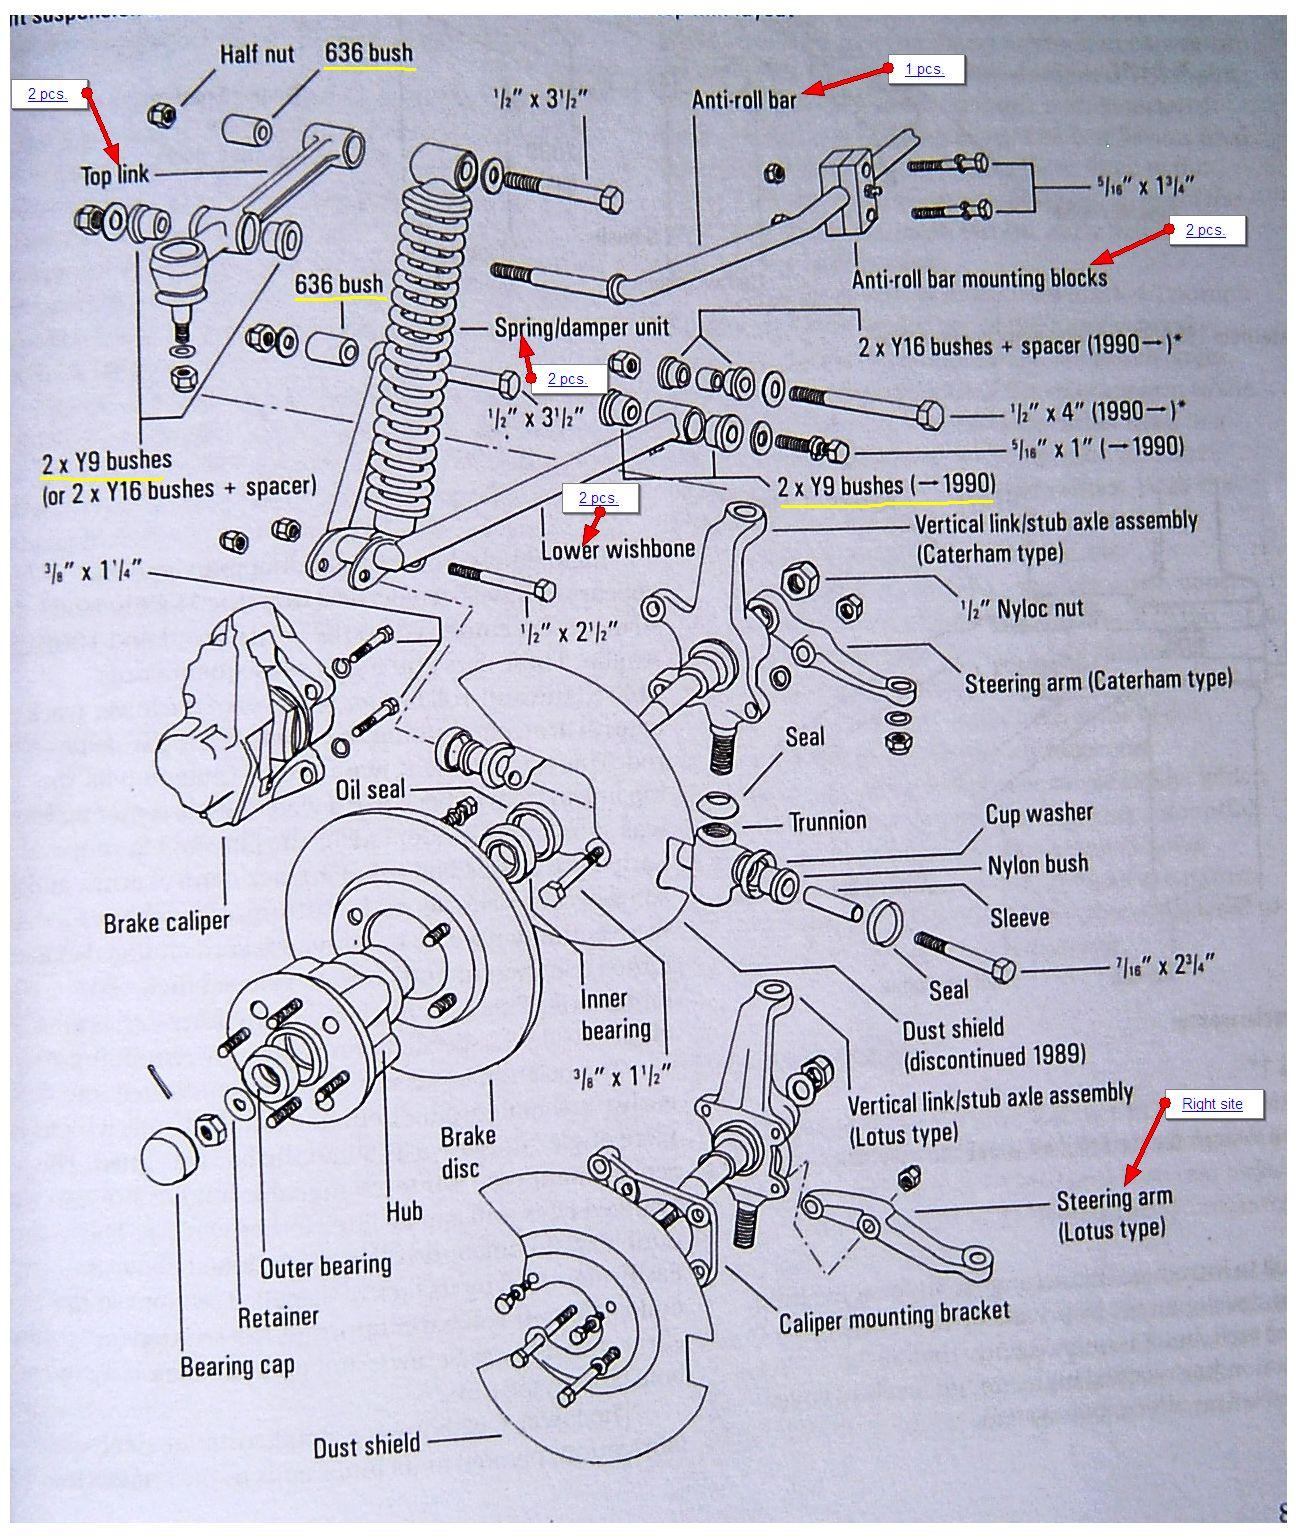 Lotus seven sb1403 parts list malvernweather Choice Image